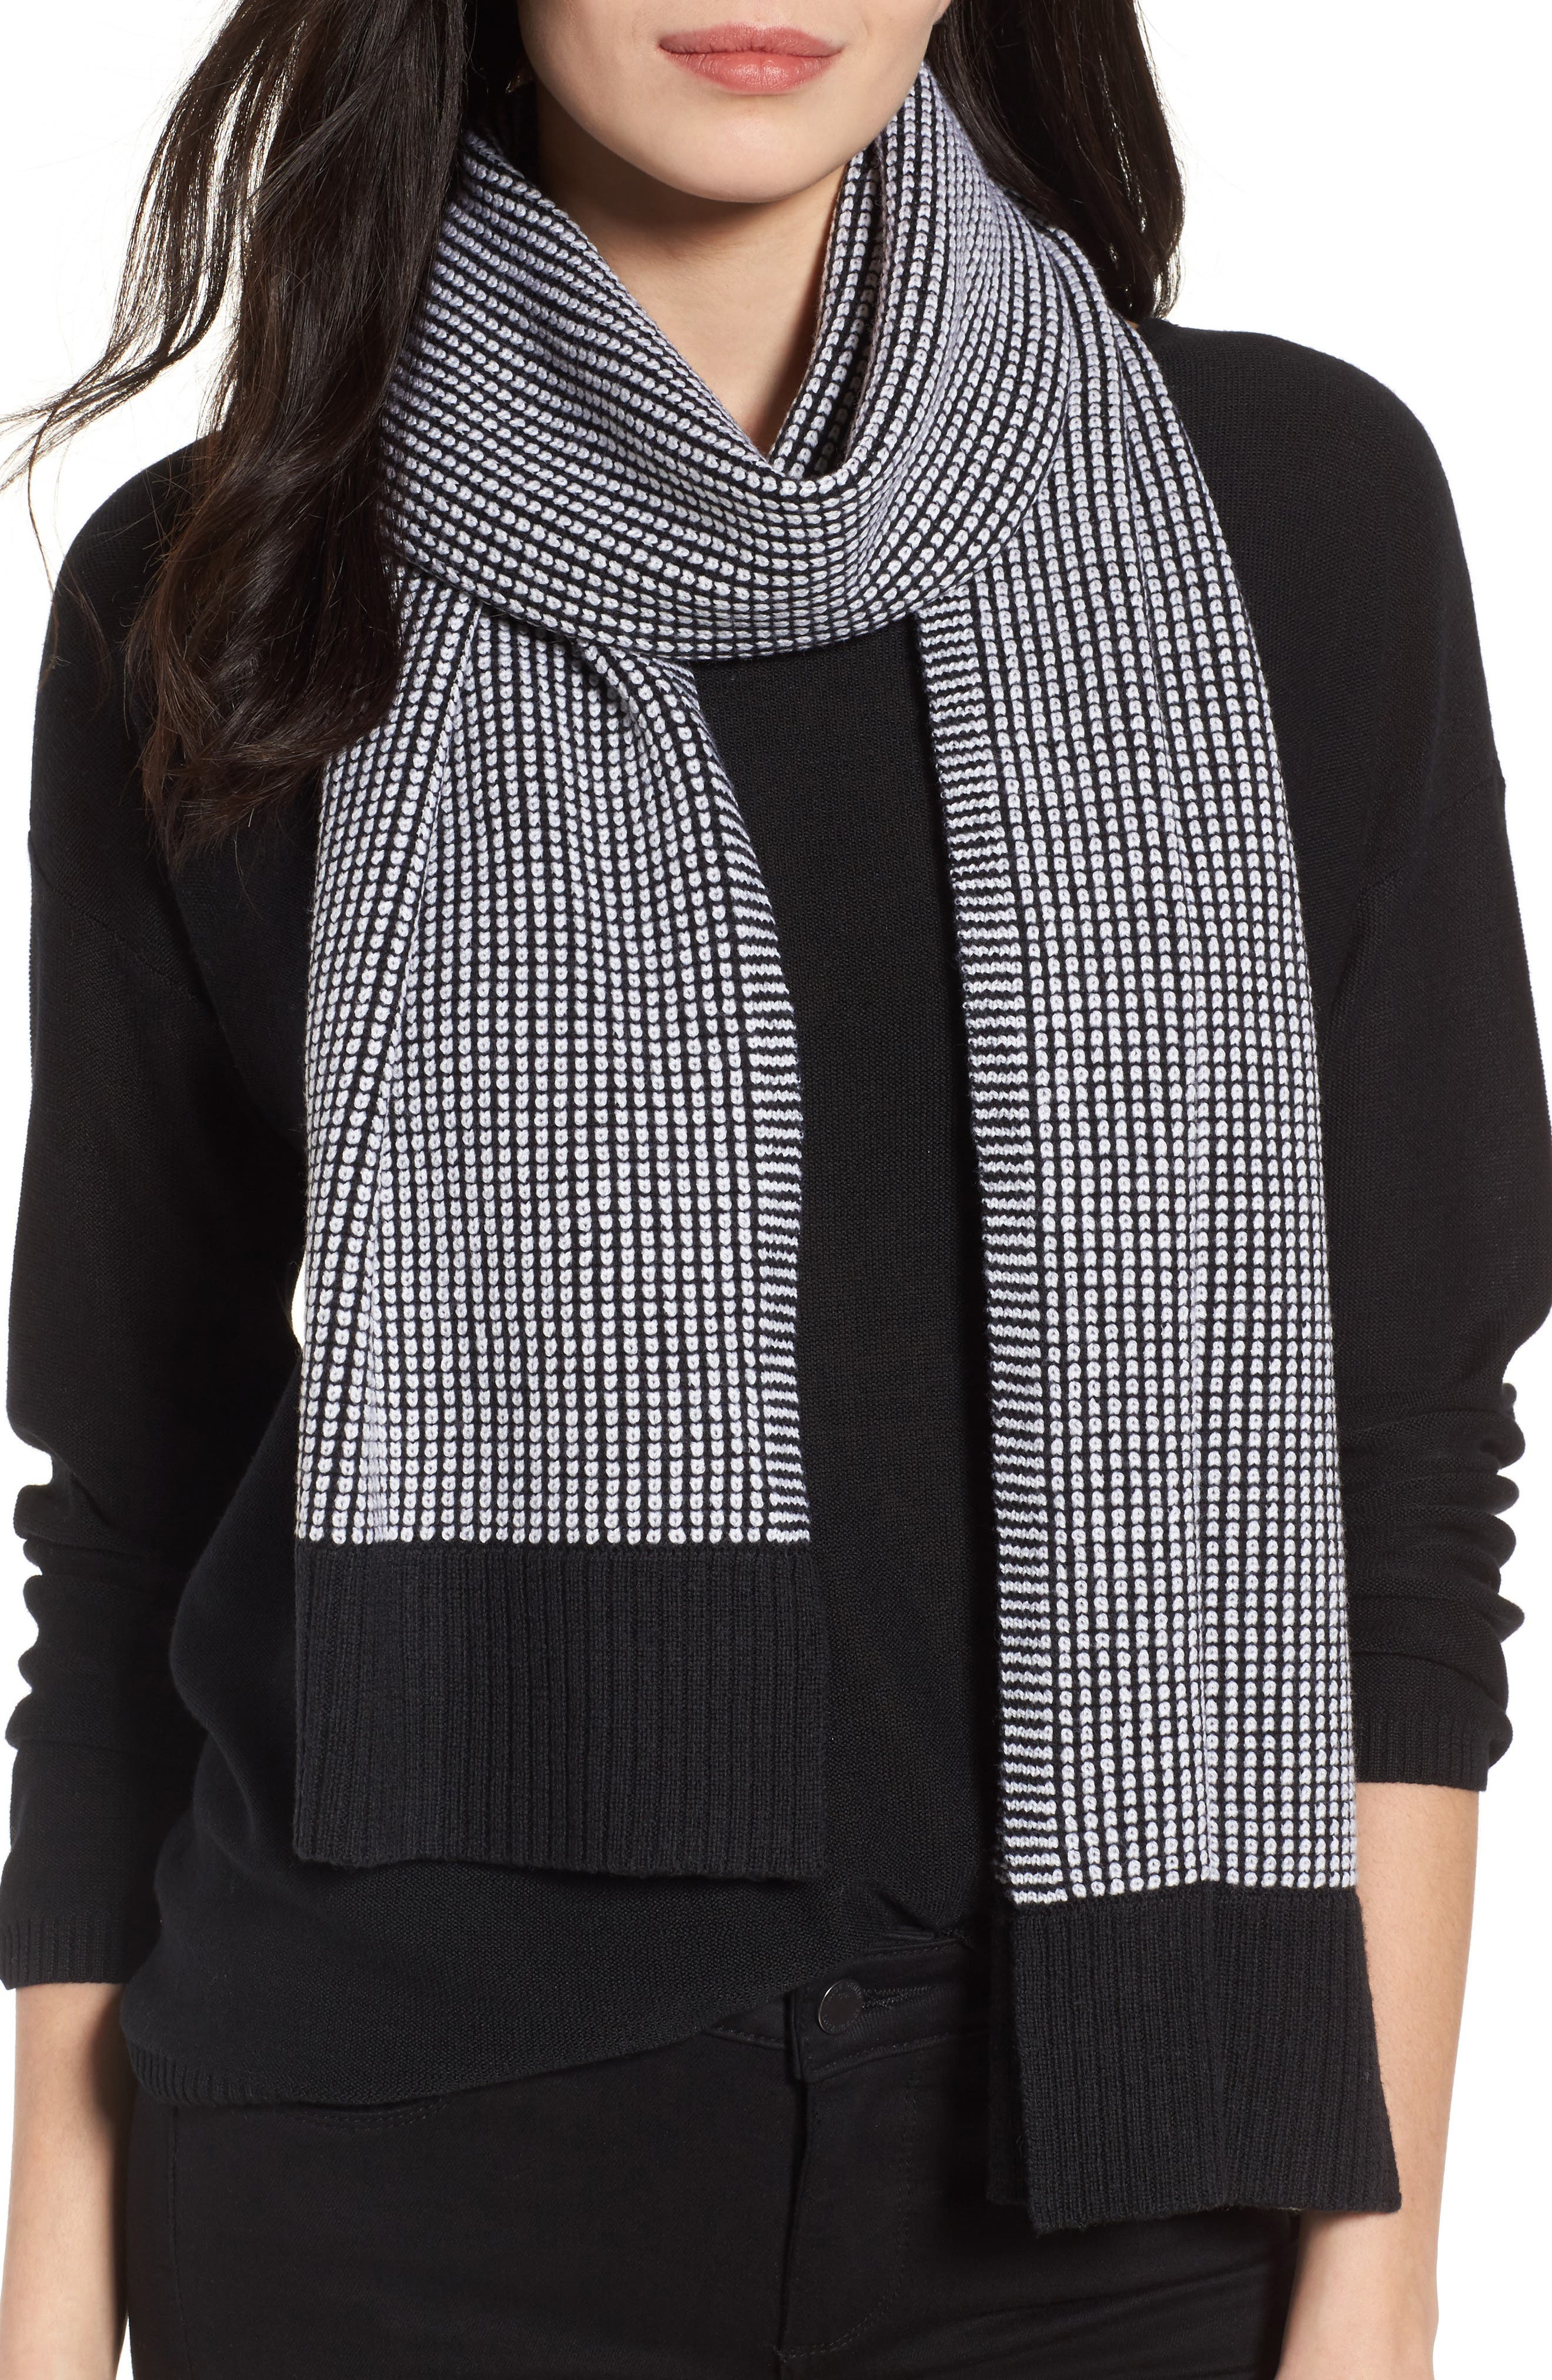 Merino Wool Scarf,                         Main,                         color, Black/ Soft White